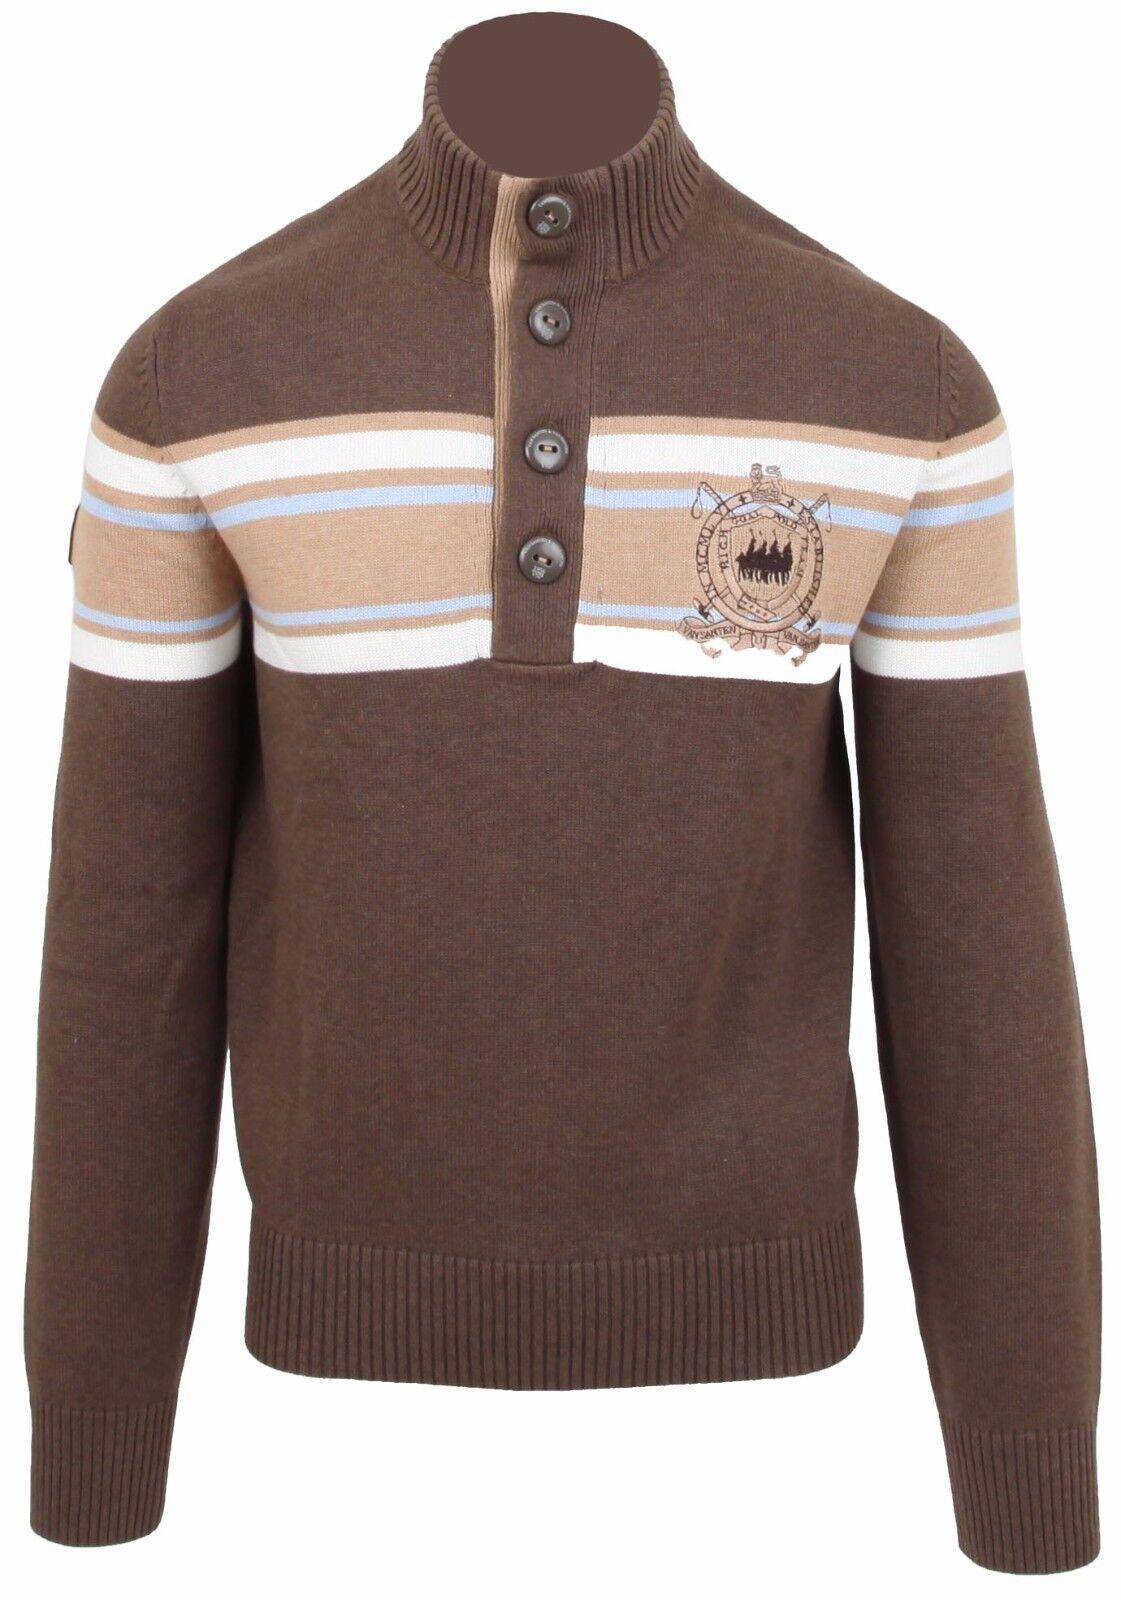 VAN SANTEN & VAN SANTEN Pullover Sweater Troyer Jumper Größe L Baumwolle Cotton